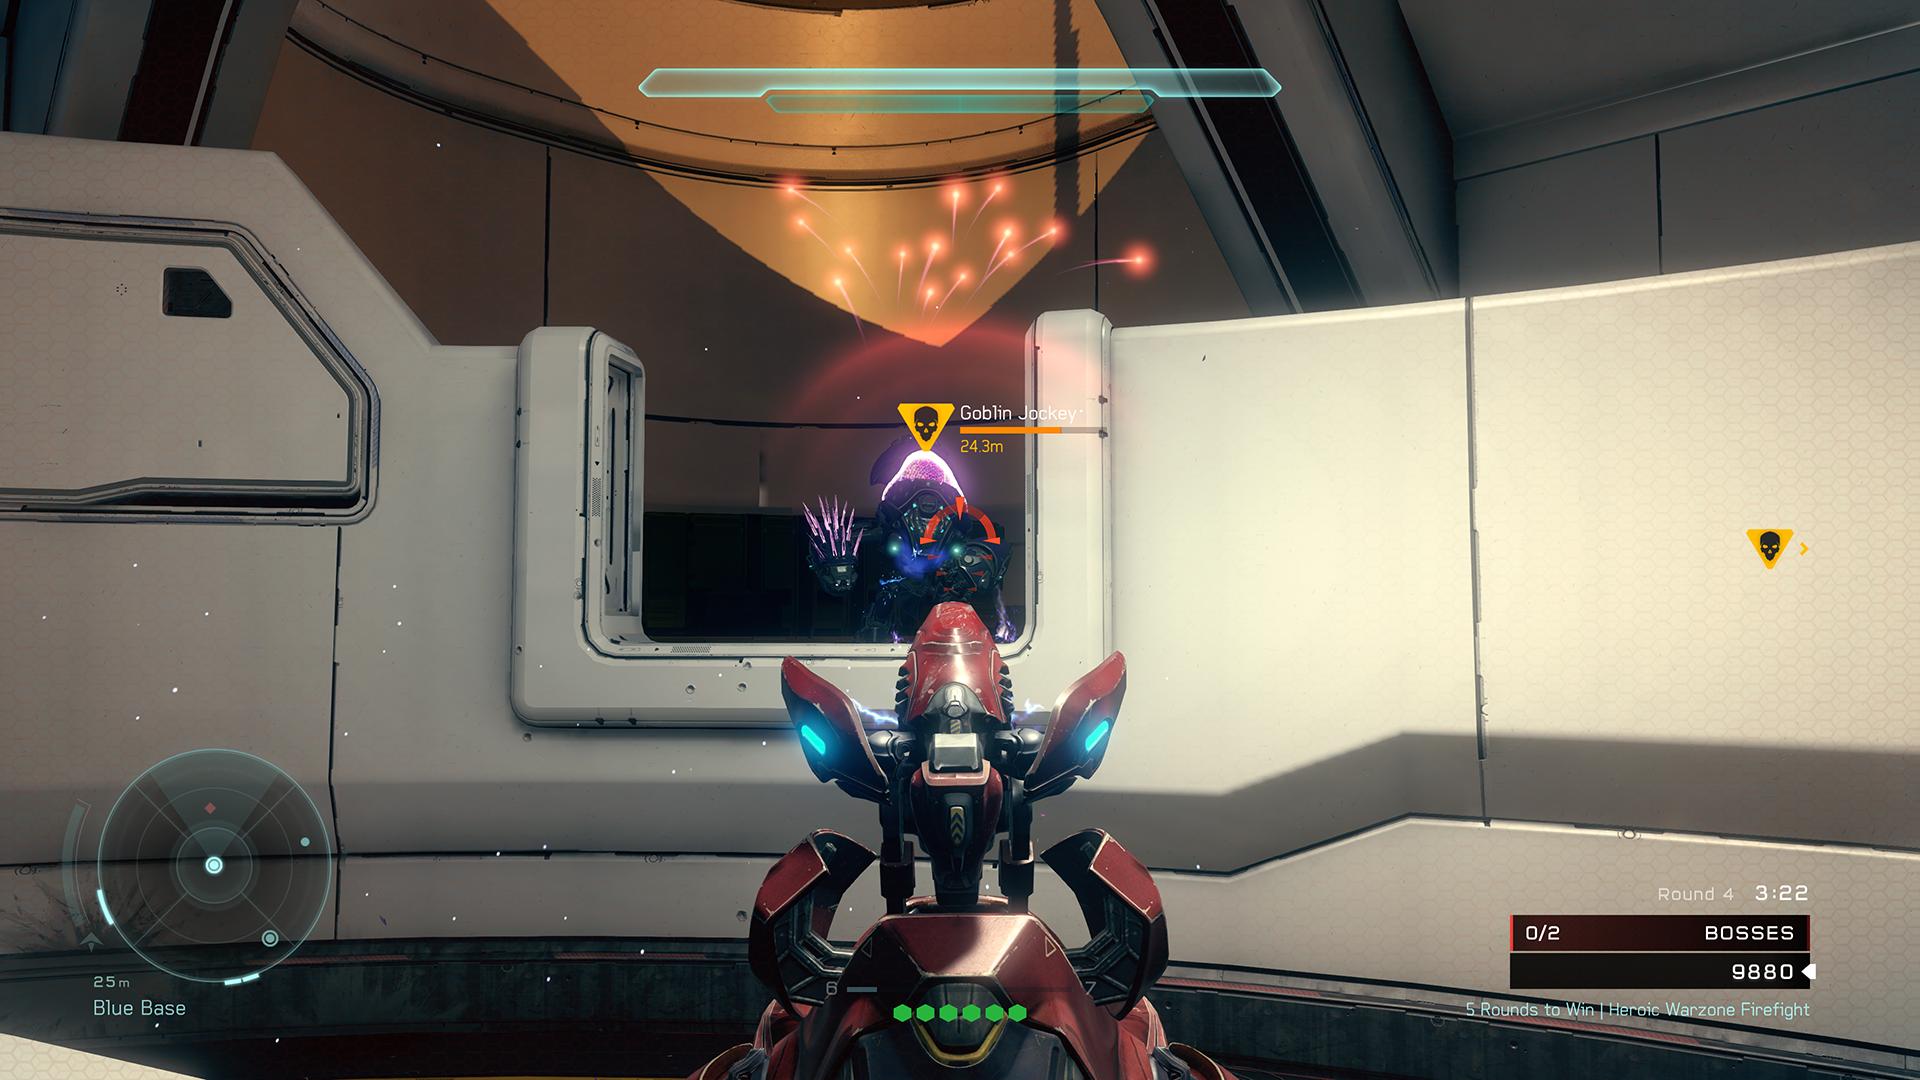 Halo 5: Guardians grunt Goblin screenshot